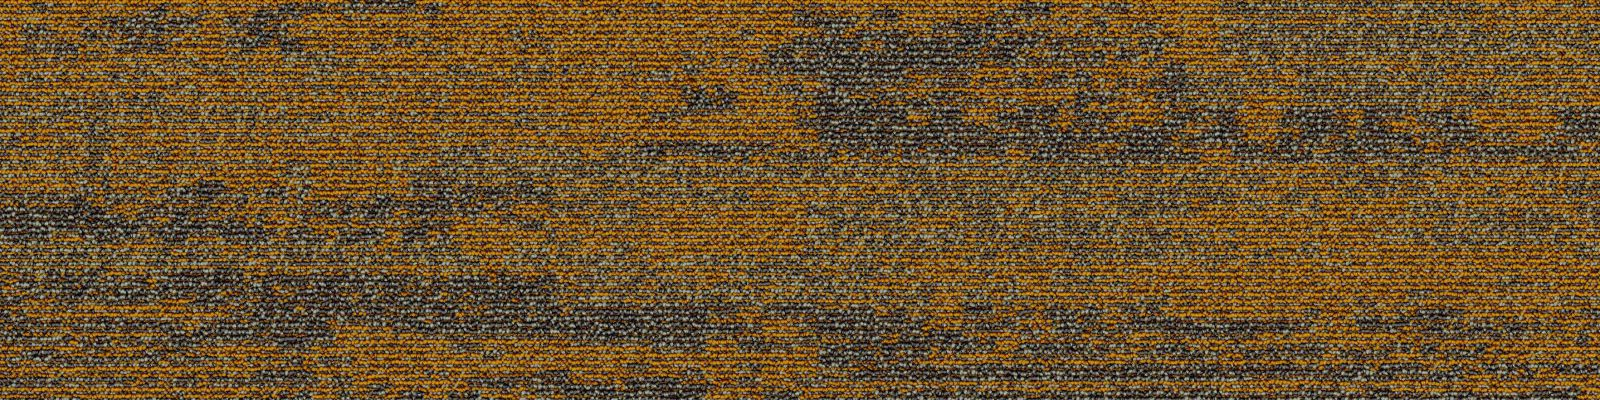 thảm skywalk 48